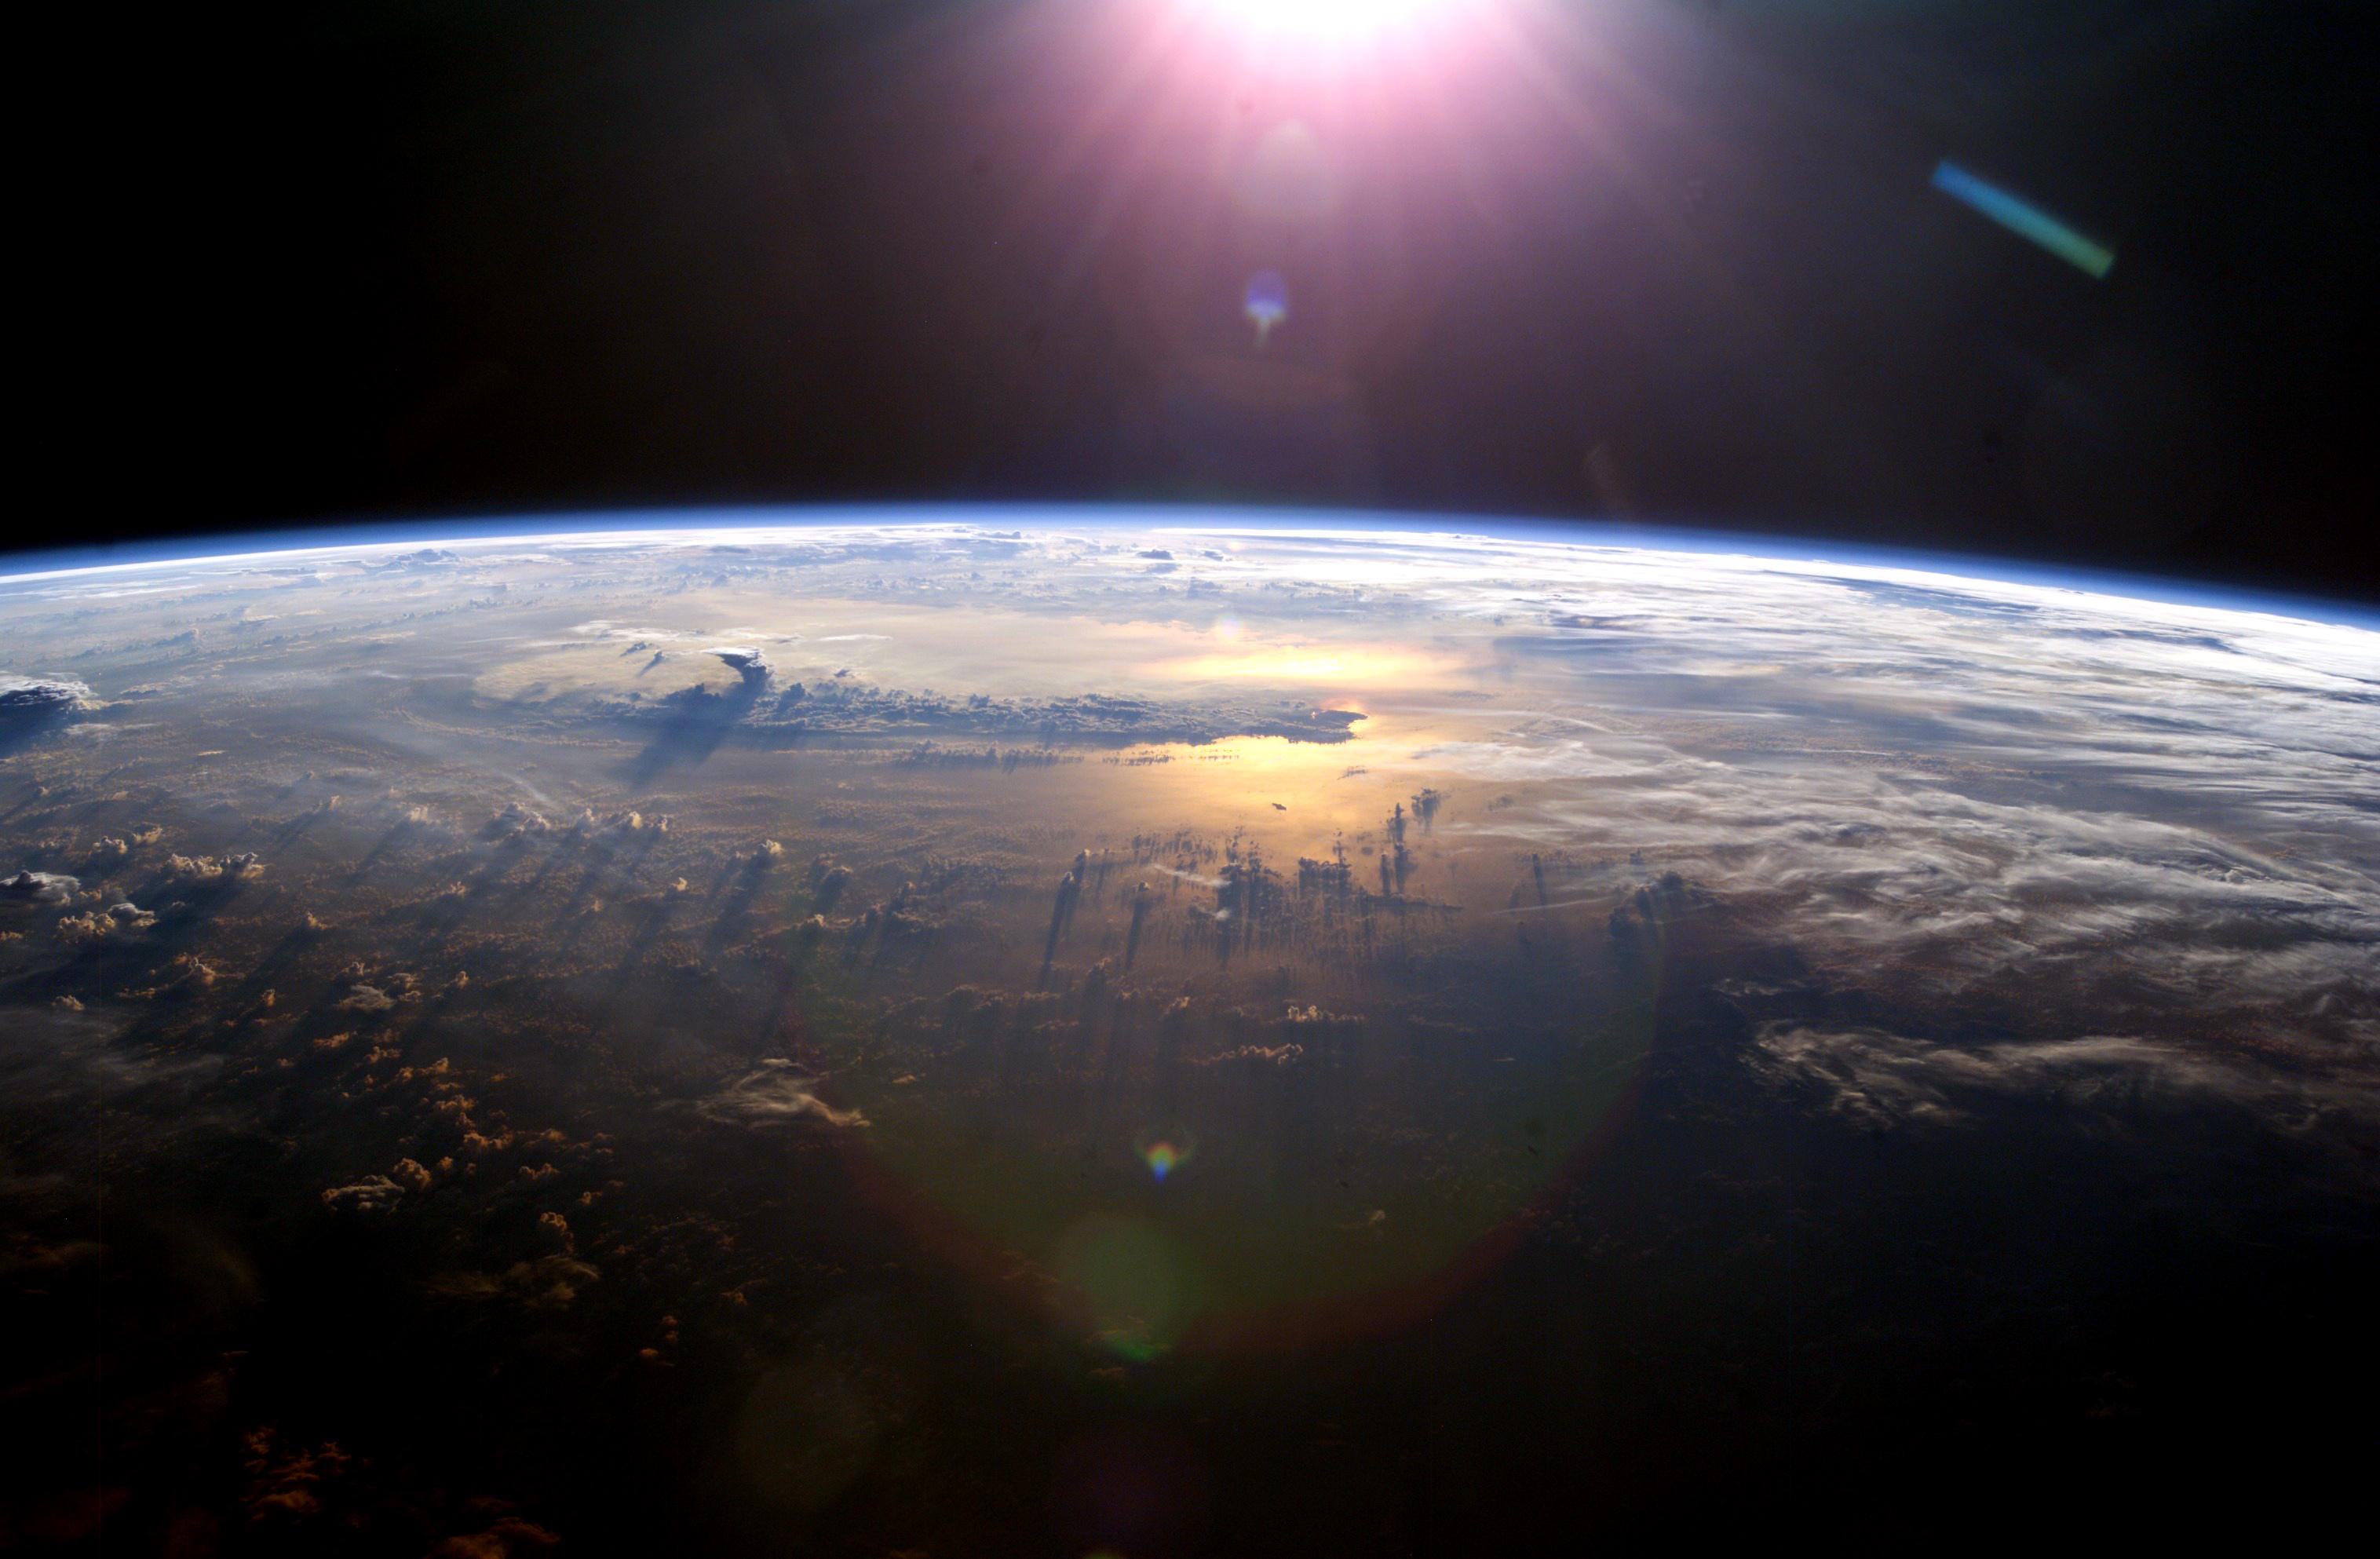 http://antwrp.gsfc.nasa.gov/apod/image/0804/ISS007-E-10807_highres.jpg